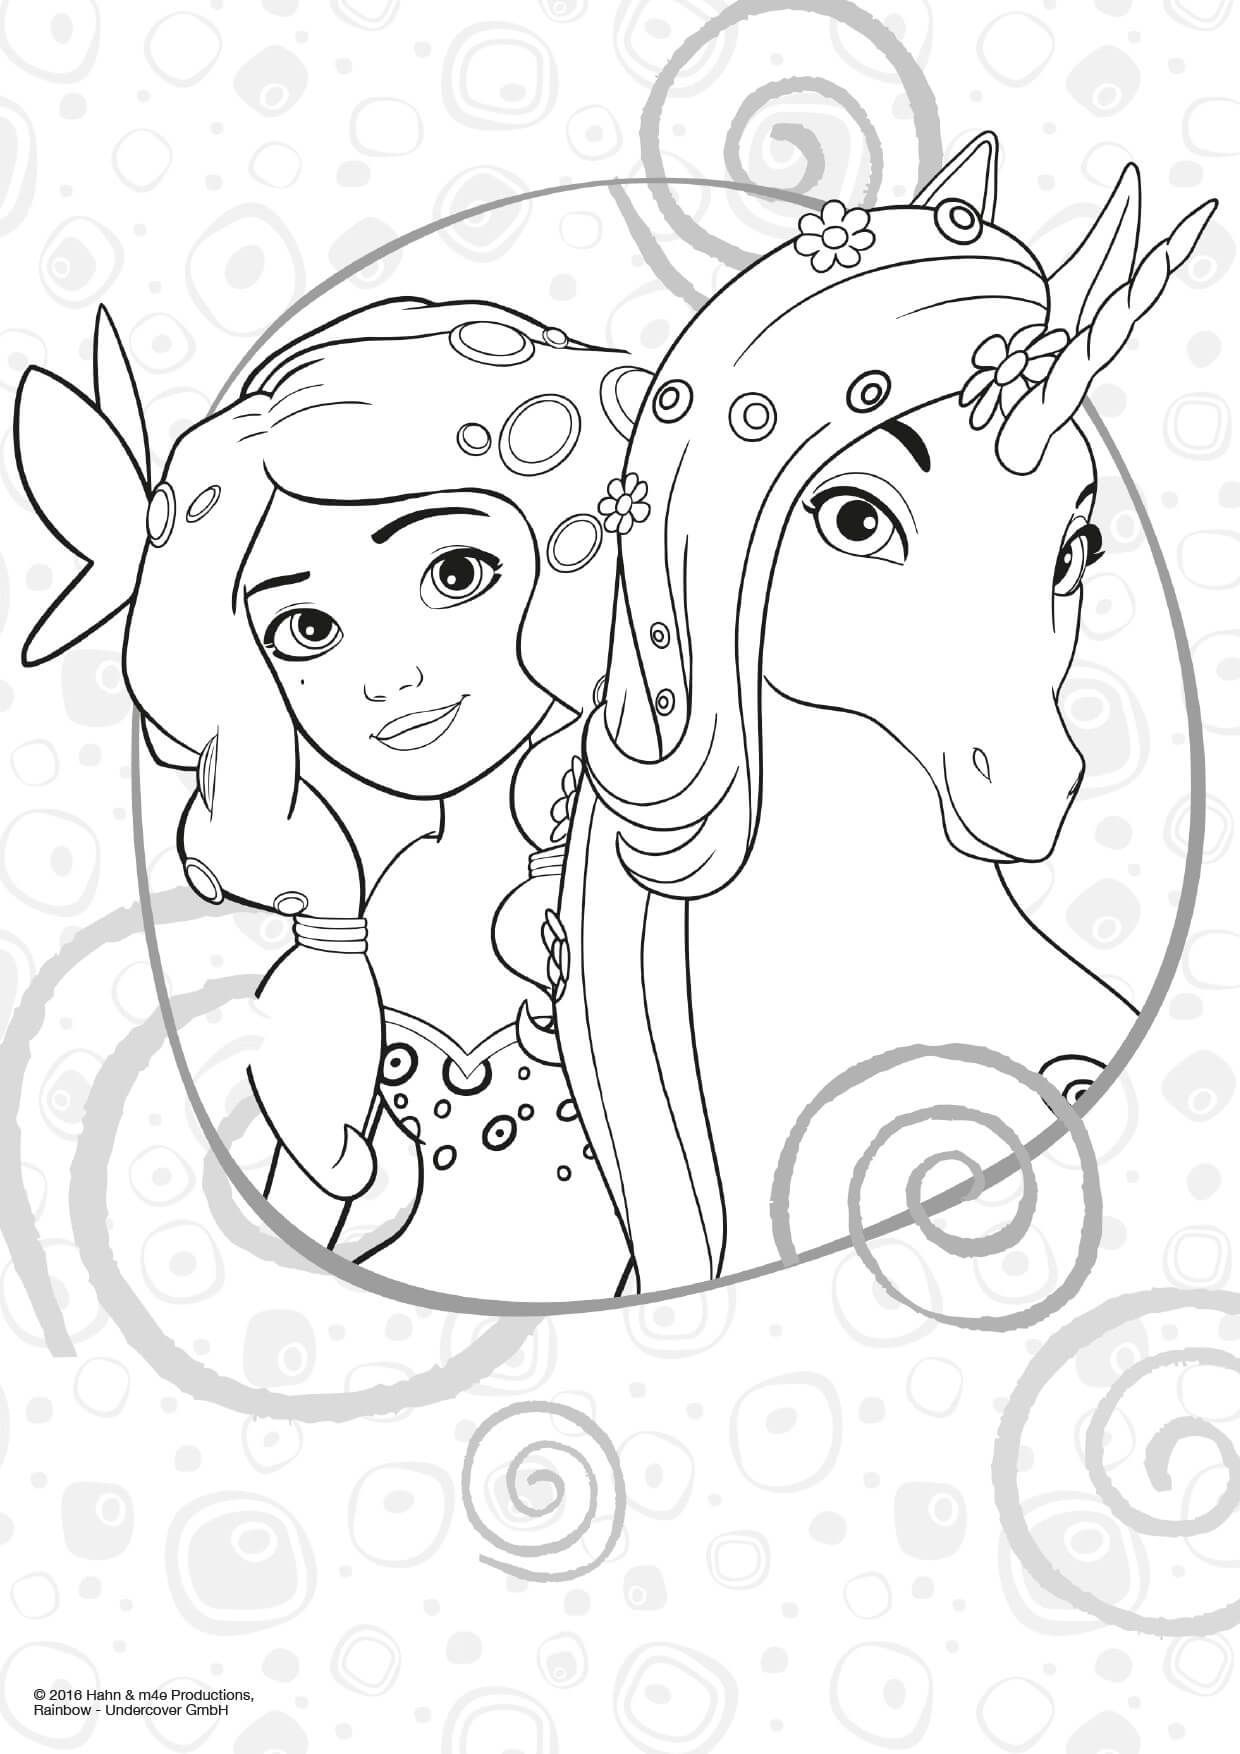 Mia & Me Malvorlagen  Unicorn coloring pages, Horse coloring